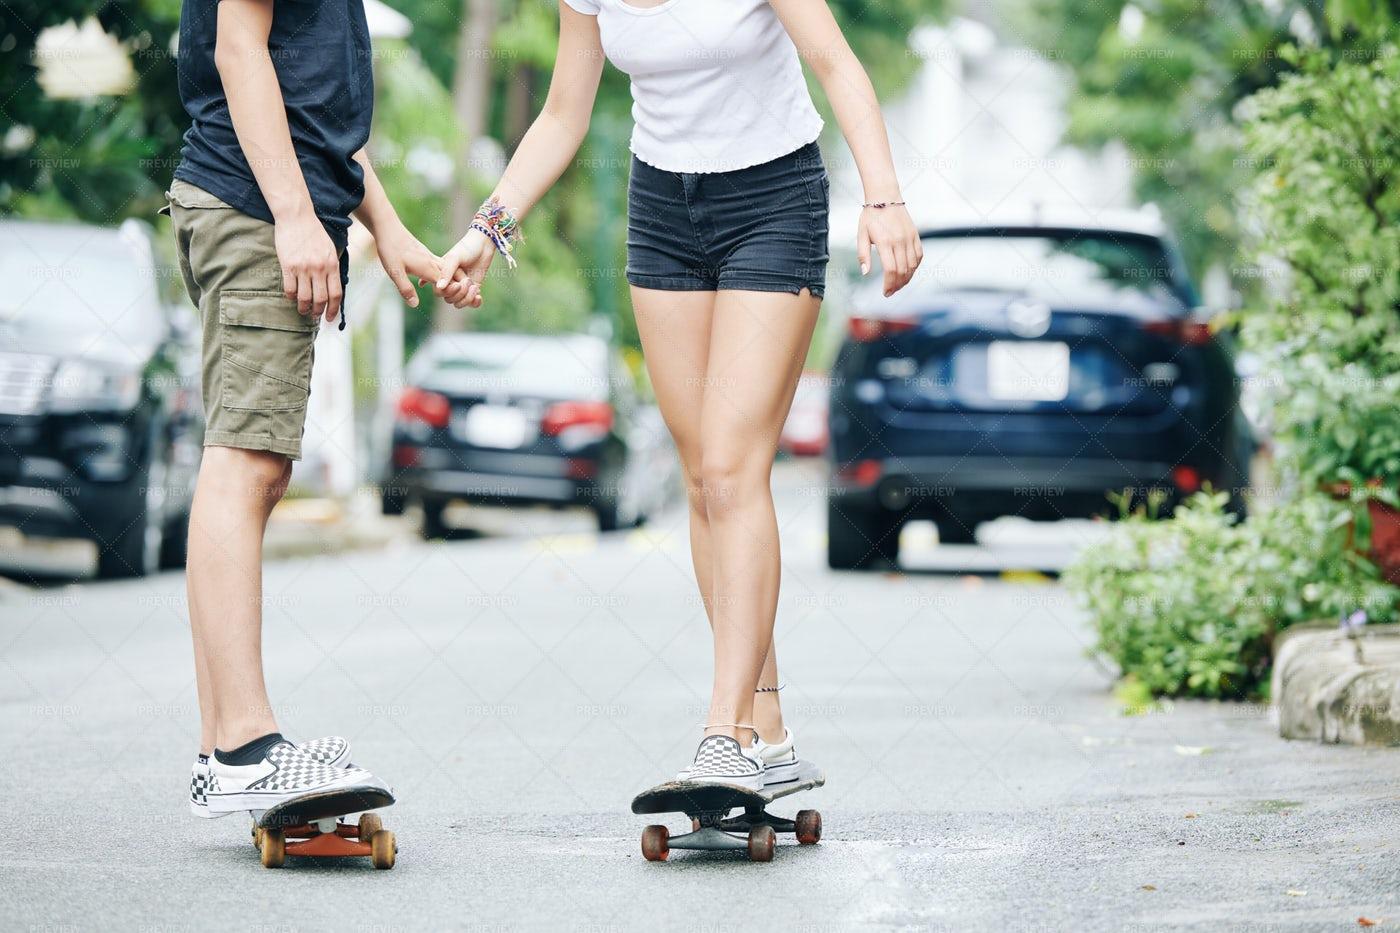 Boy Giving Fist Lesson Of Skateboardin: Stock Photos